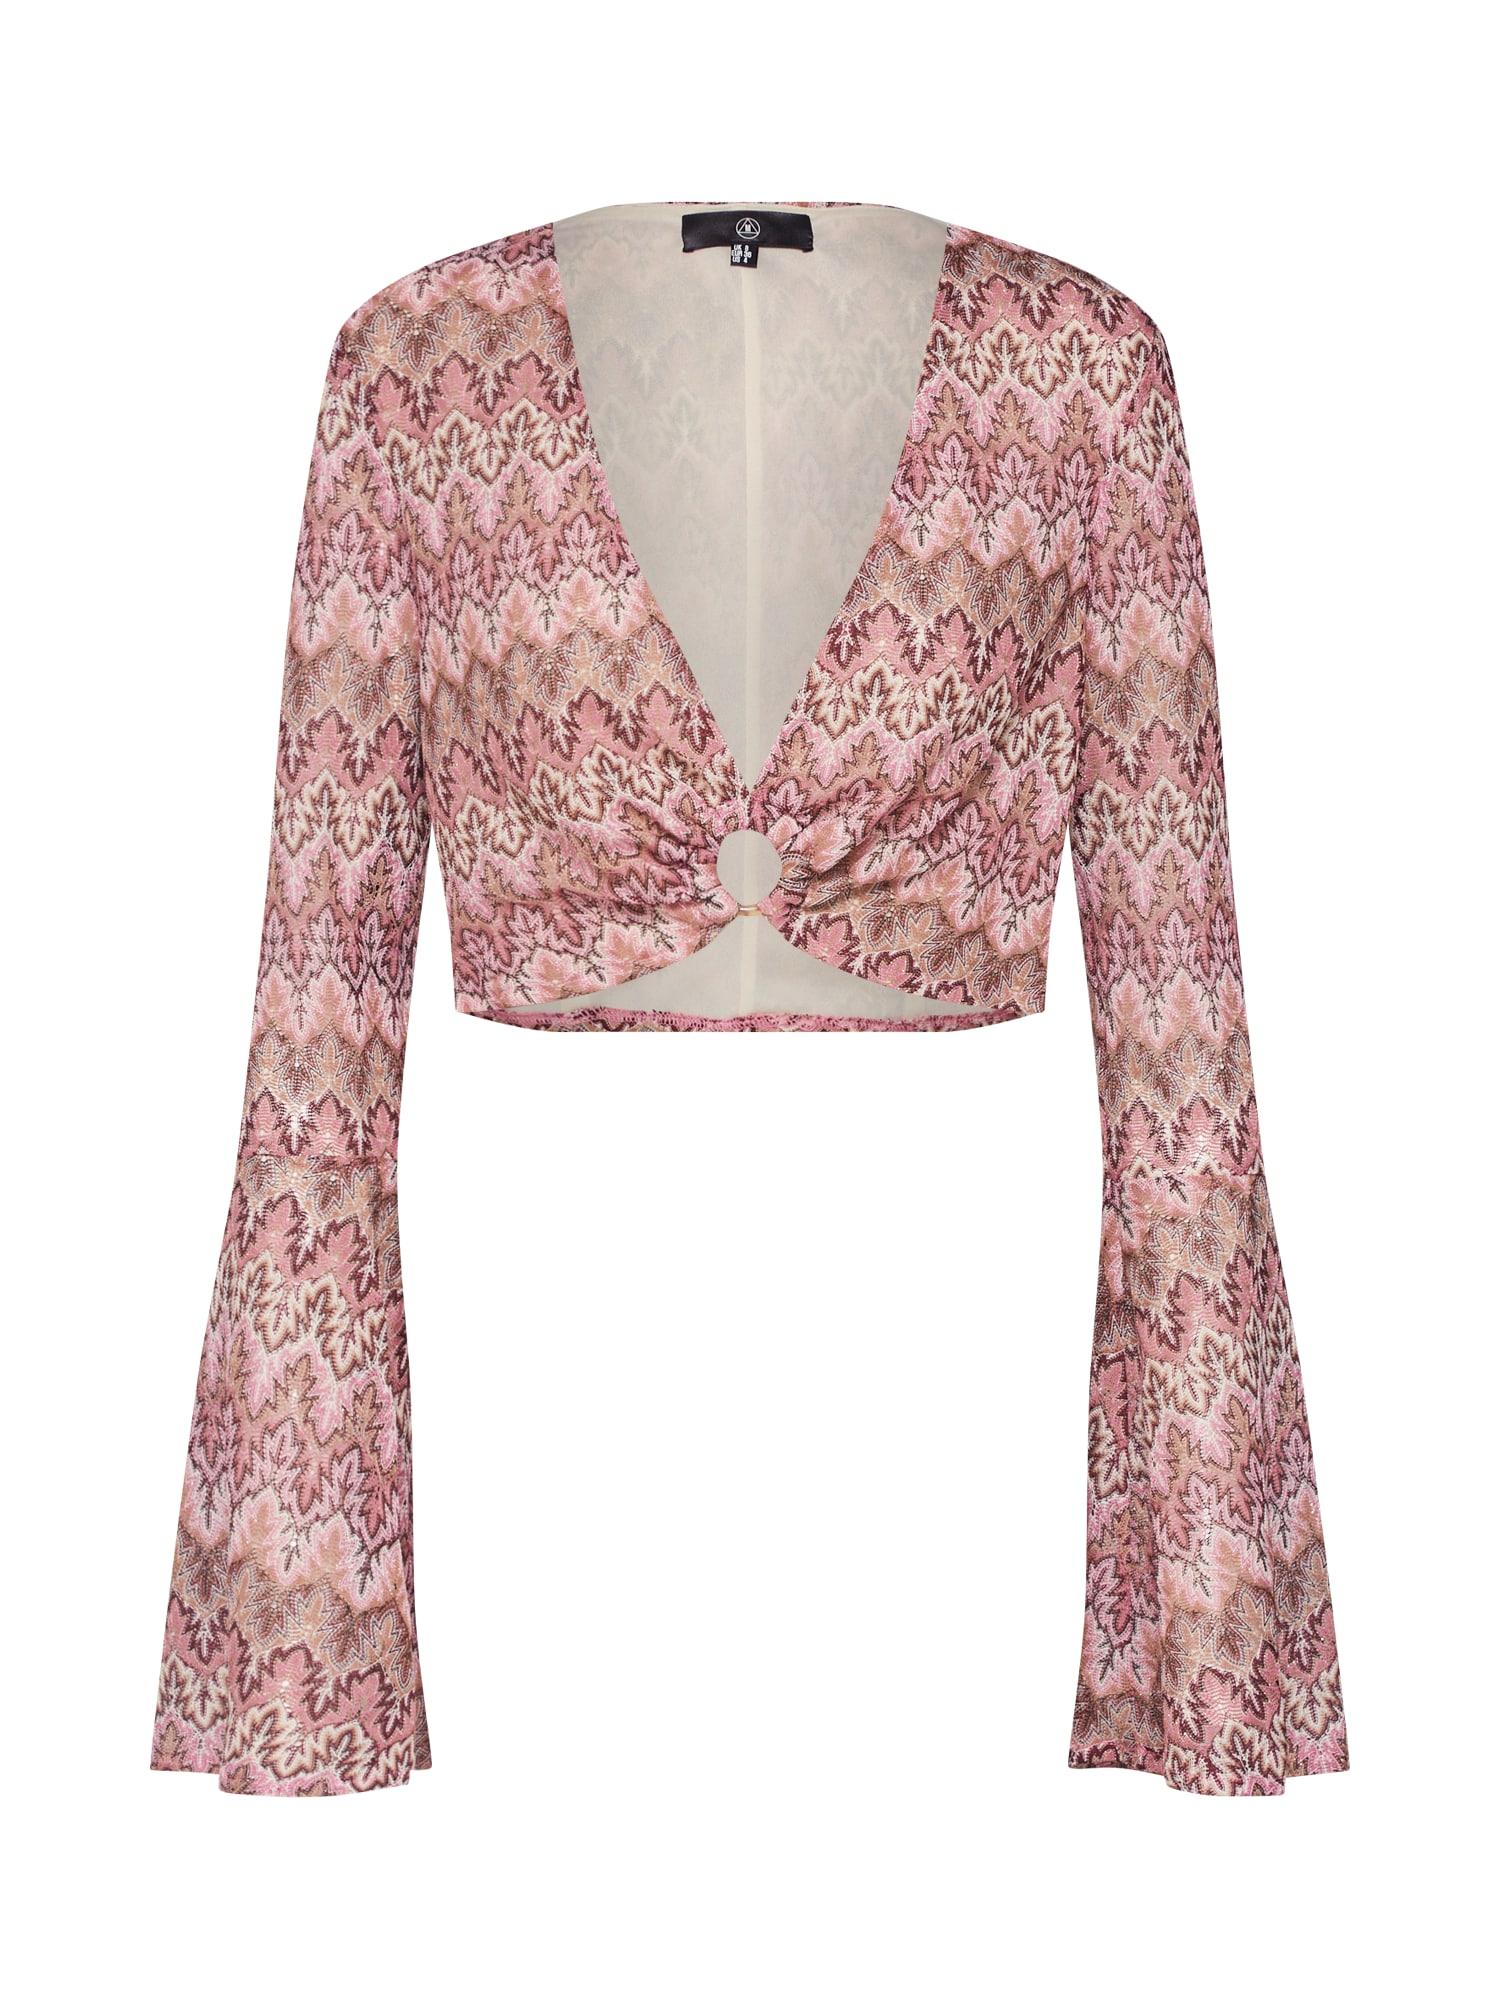 Tričko Chevron Print O ring Flared Sleeve Top Pink hnědá růžová bílá Missguided